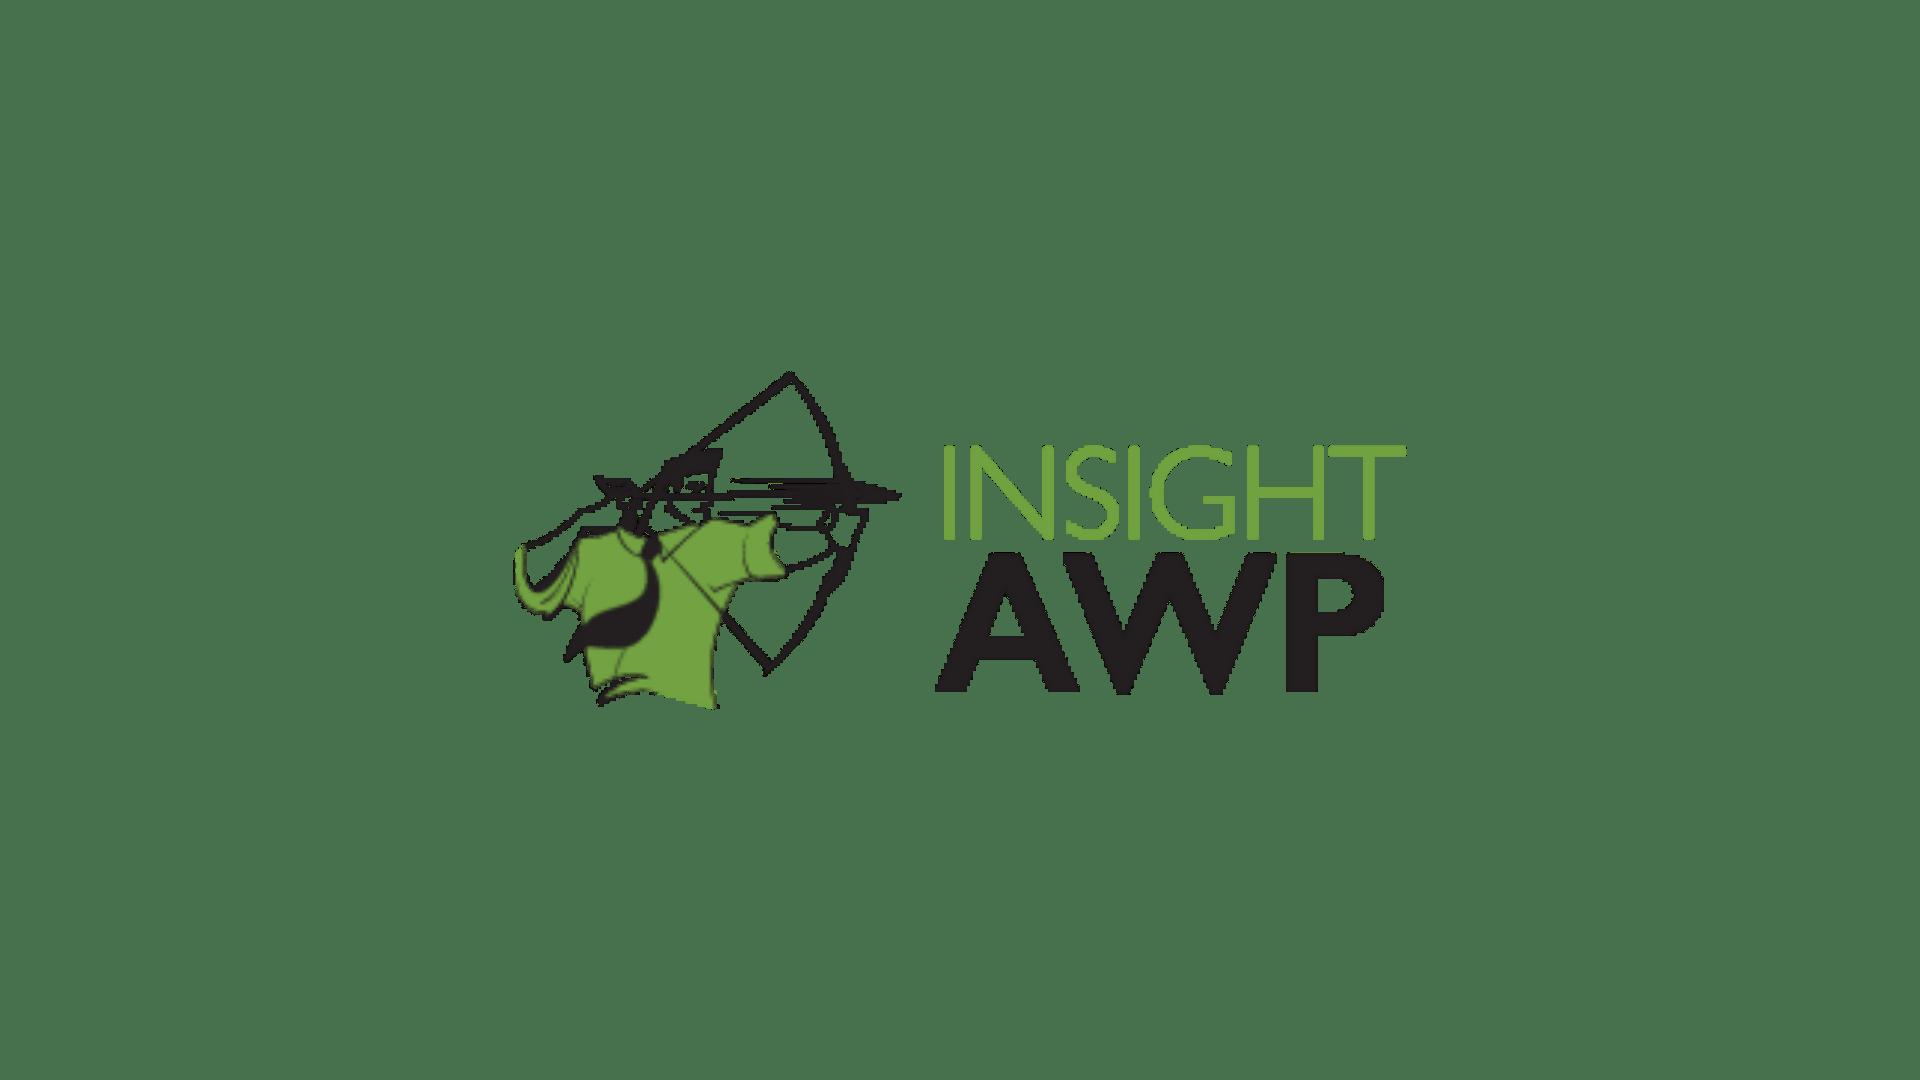 insight awp